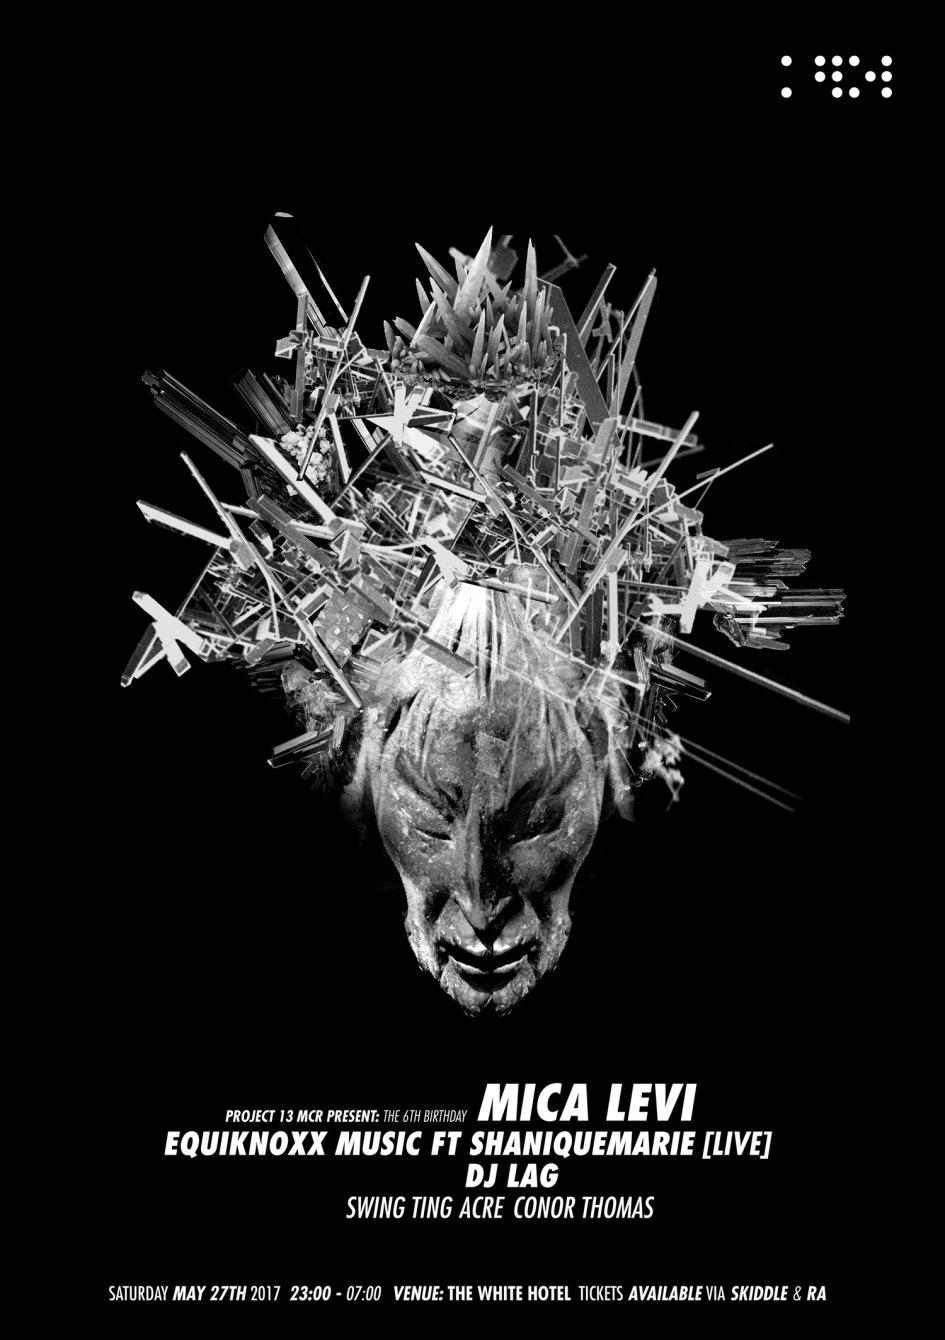 P13: Mica Levi / Equiknoxx / DJ Lag / Swing Ting - Flyer front